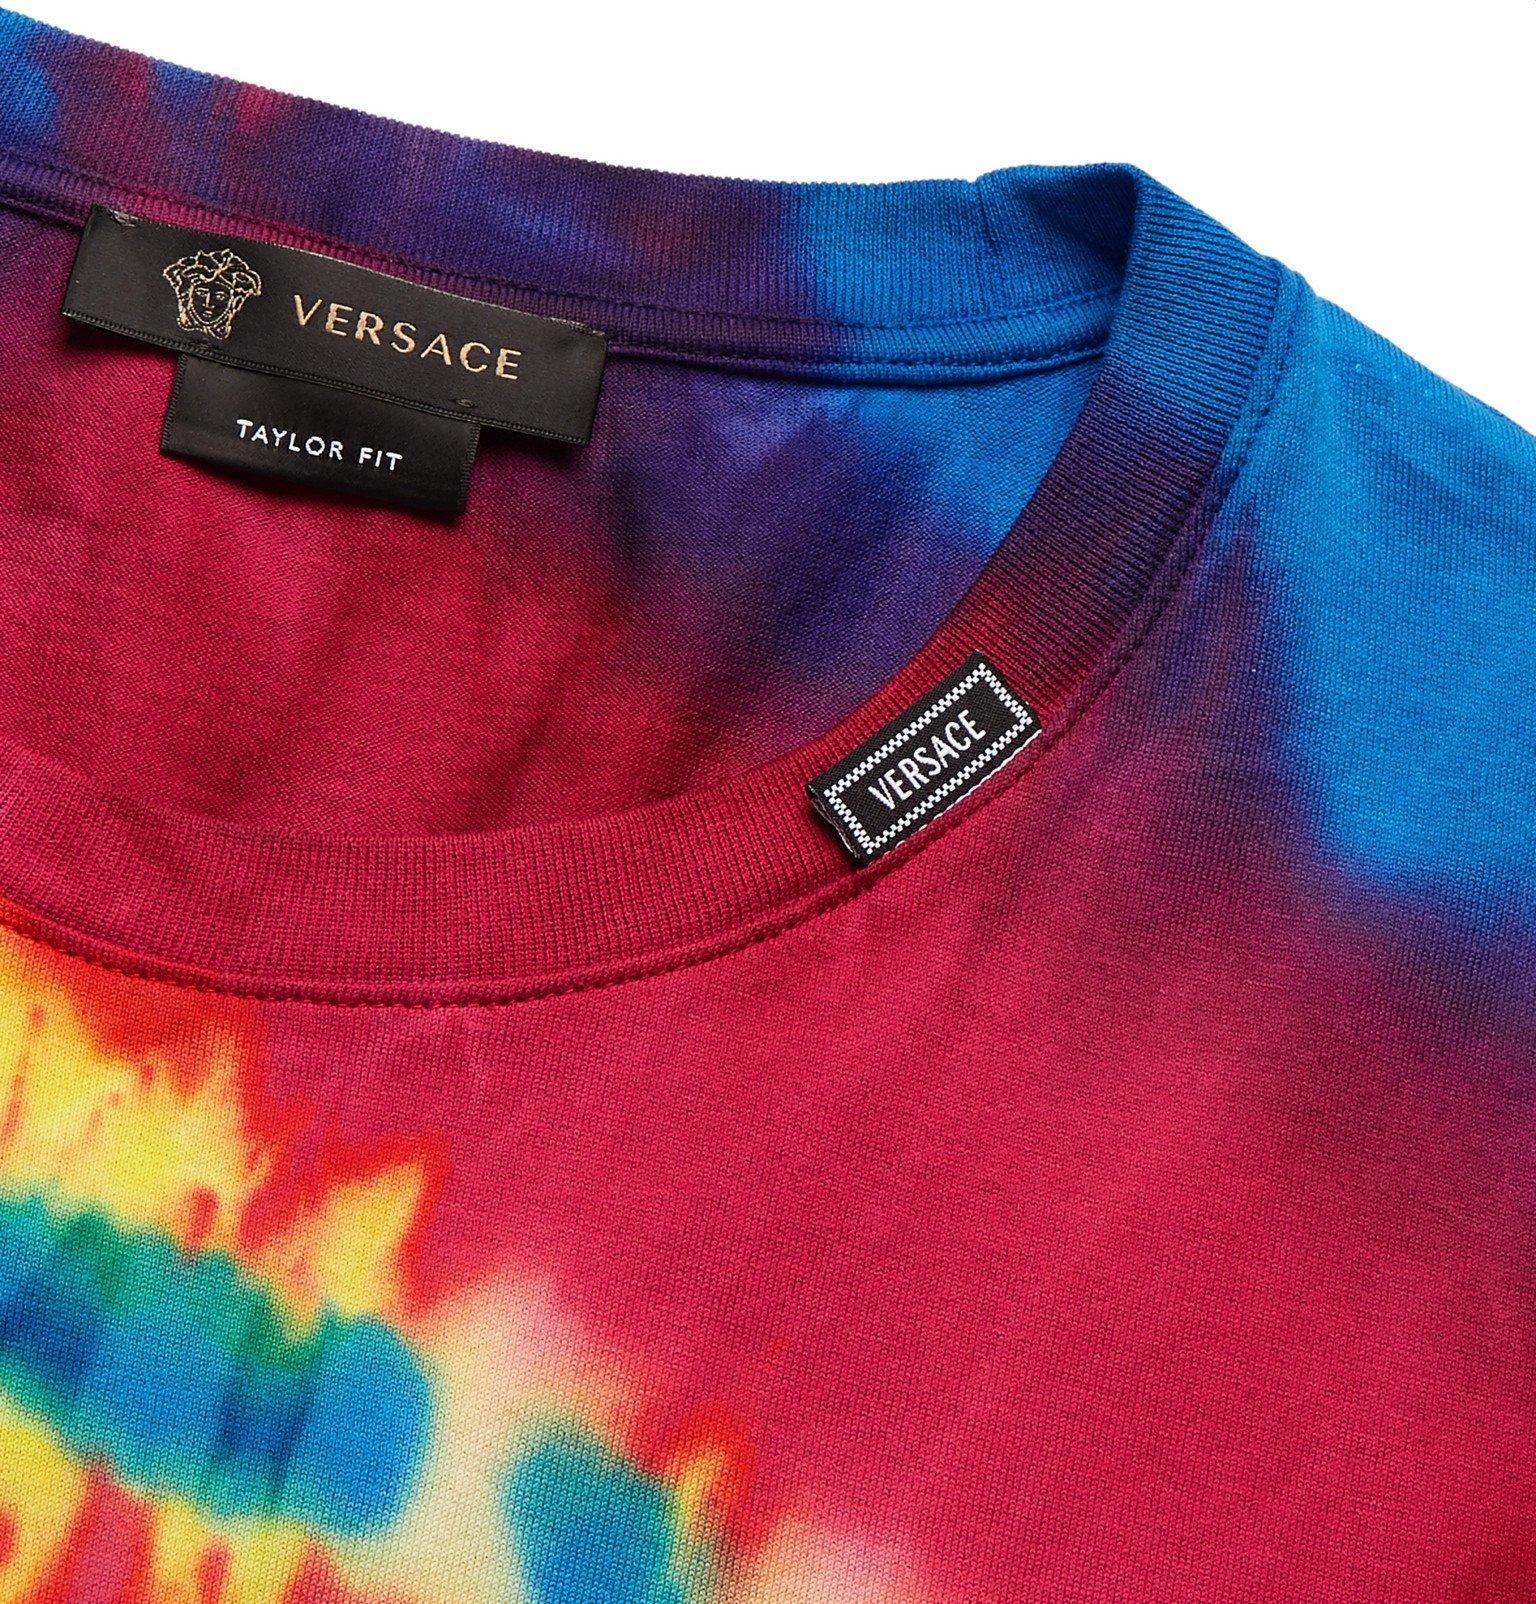 Versace - Slim-Fit Tie-Dyed Cotton-Jersey T-Shirt - Multi